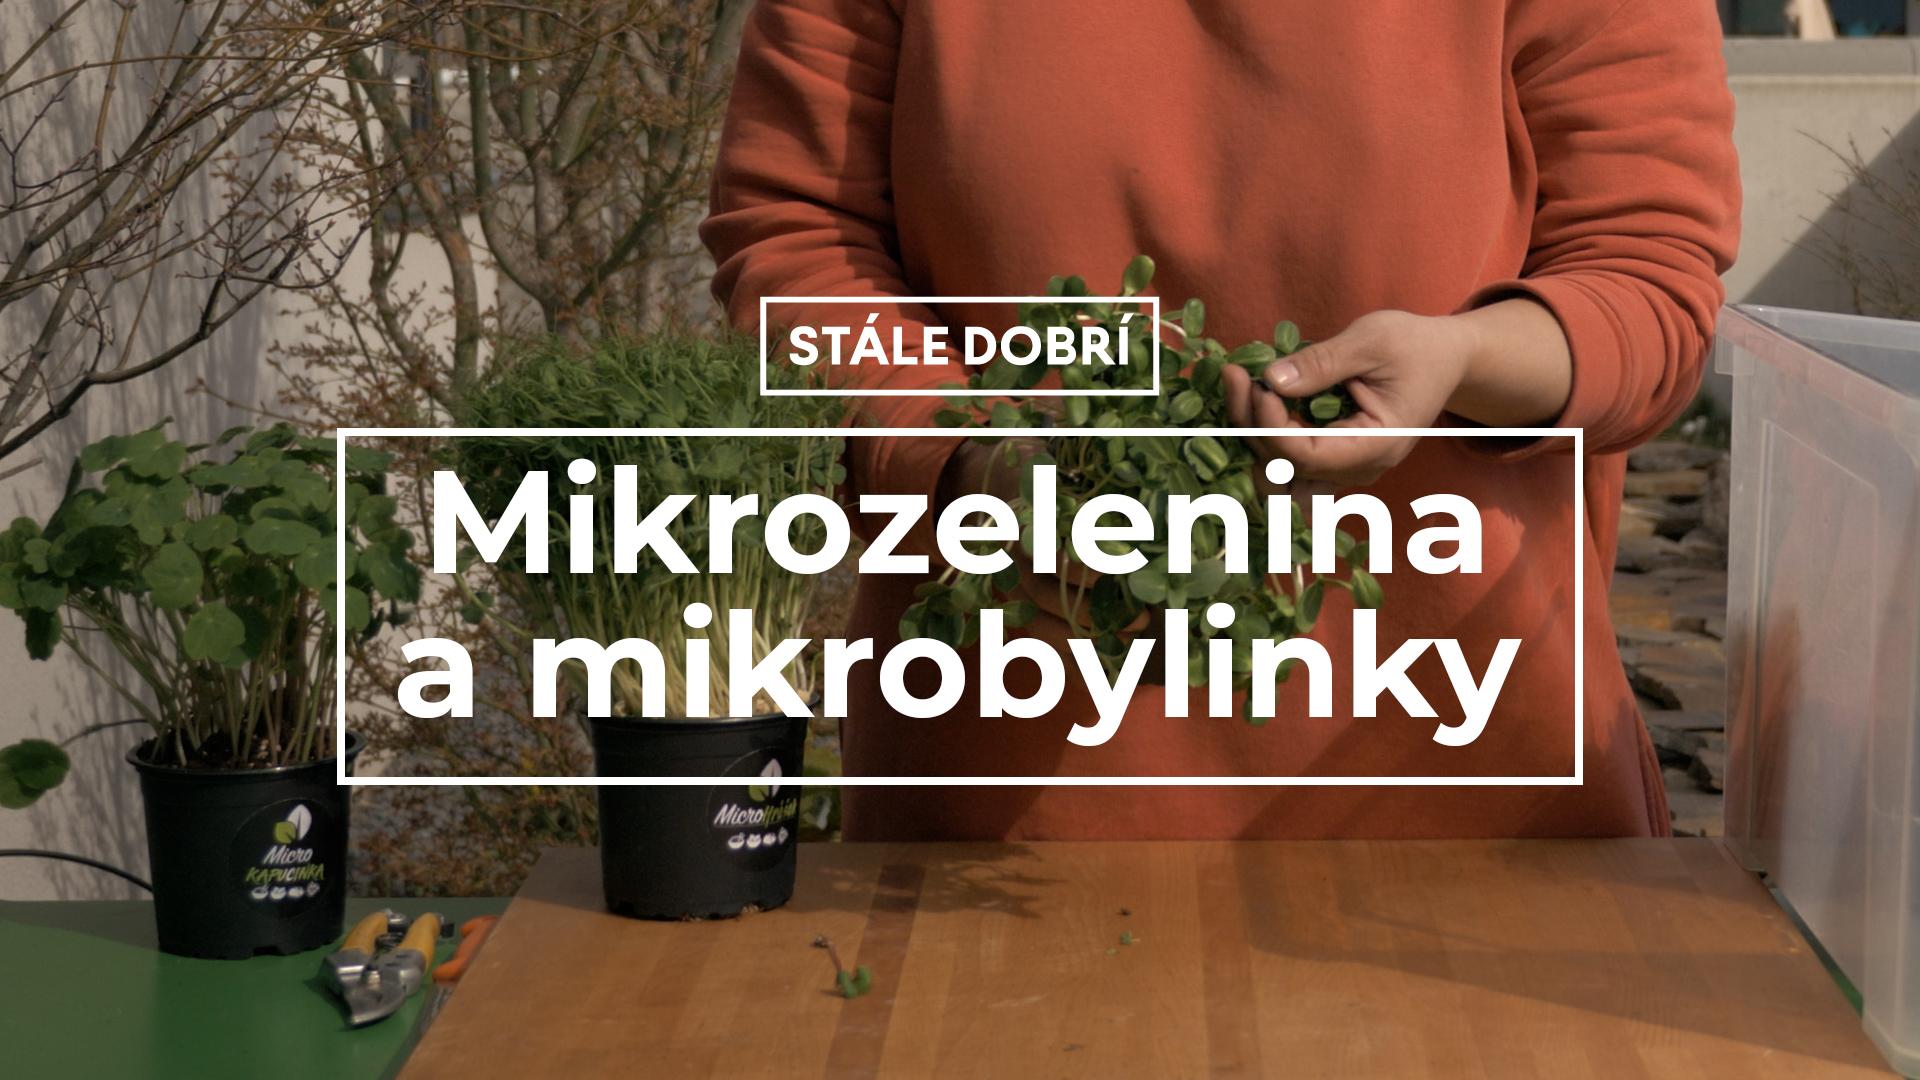 Mikrozelenina a mikrobylinky